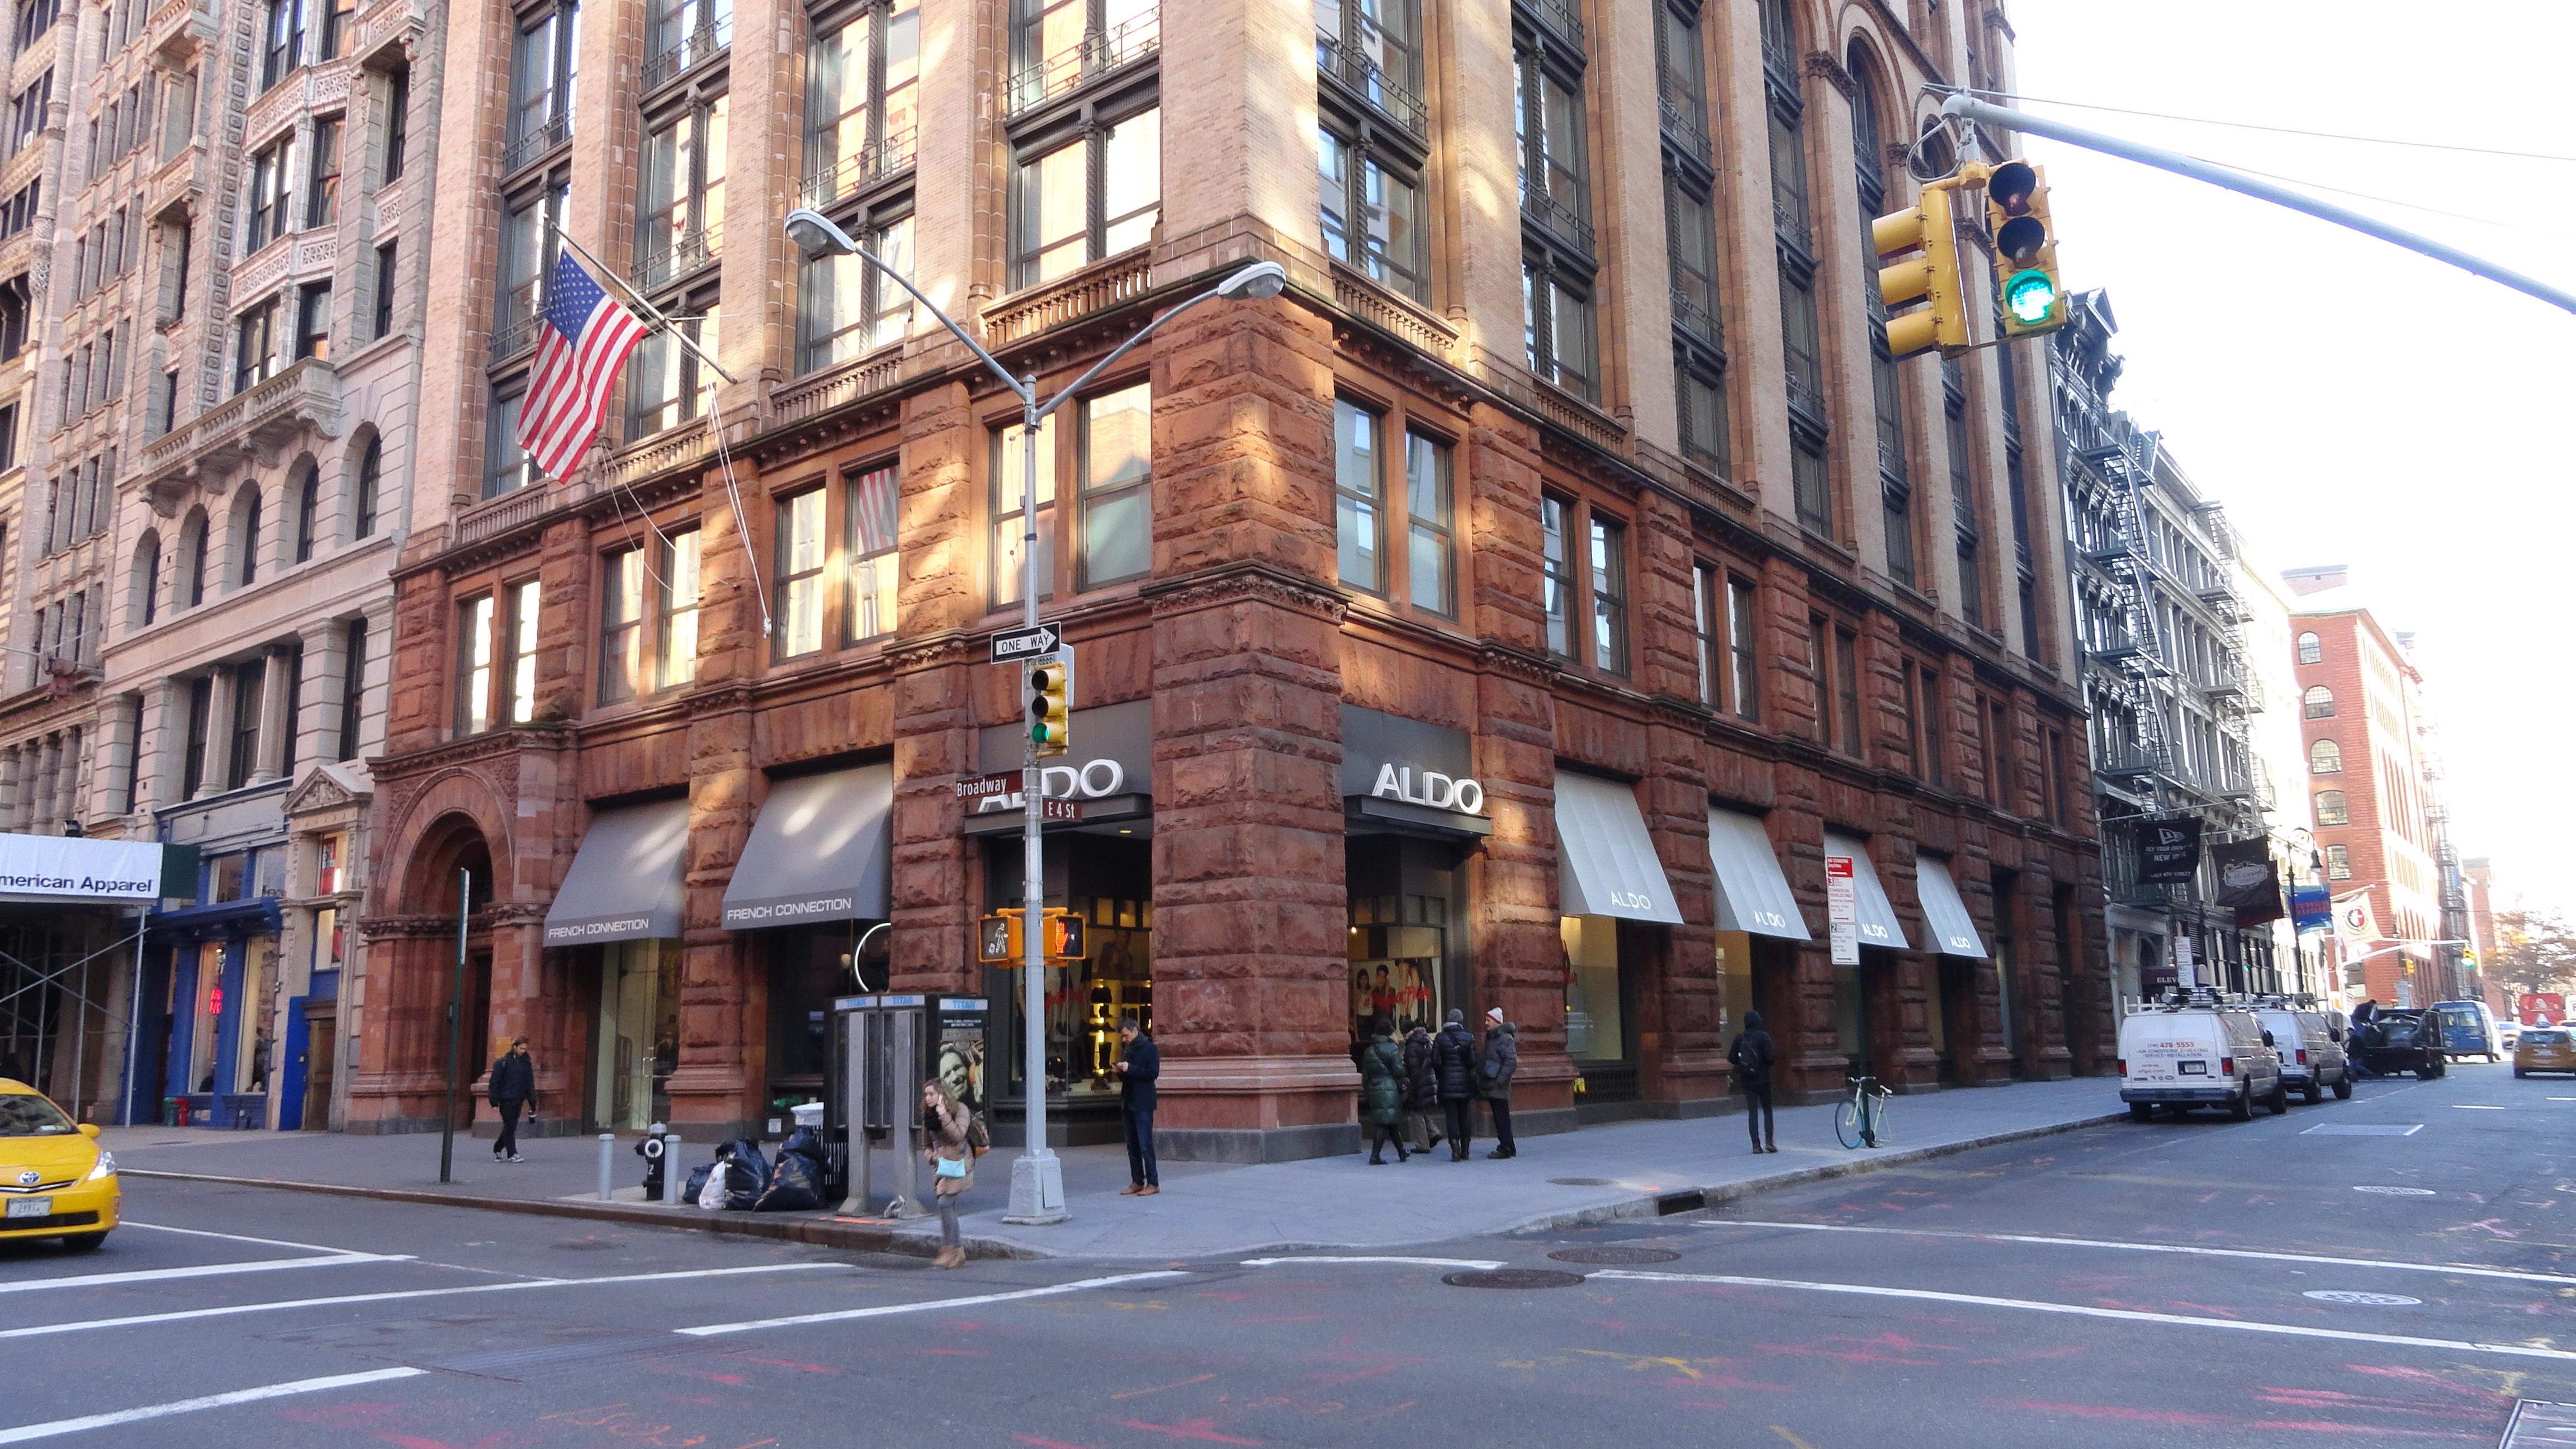 700 Broadway, Manhattan, New York, future home of TWC Experience Store